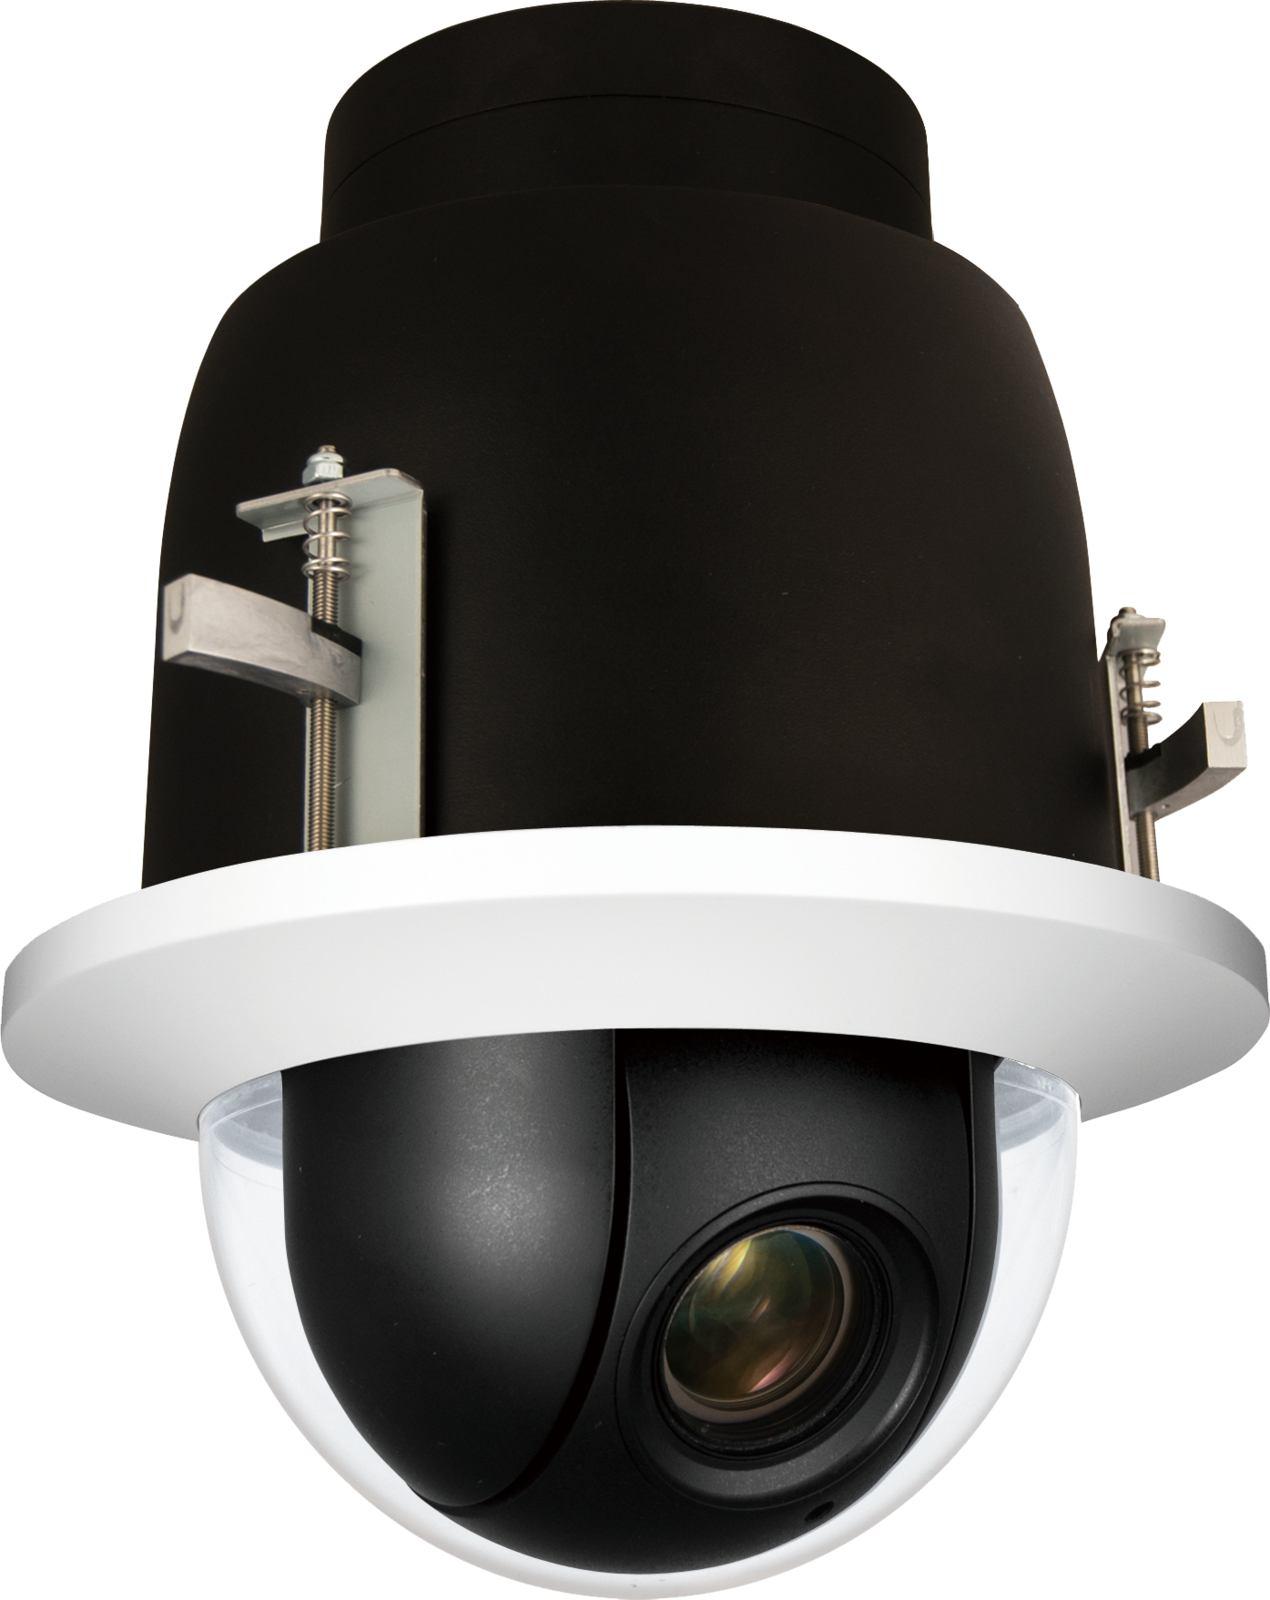 2022274-Orion-DX-832IH-Indoor-inc-PSU-PTZ-30x-zoom-1080p-120dB-UWDR-EIS-P